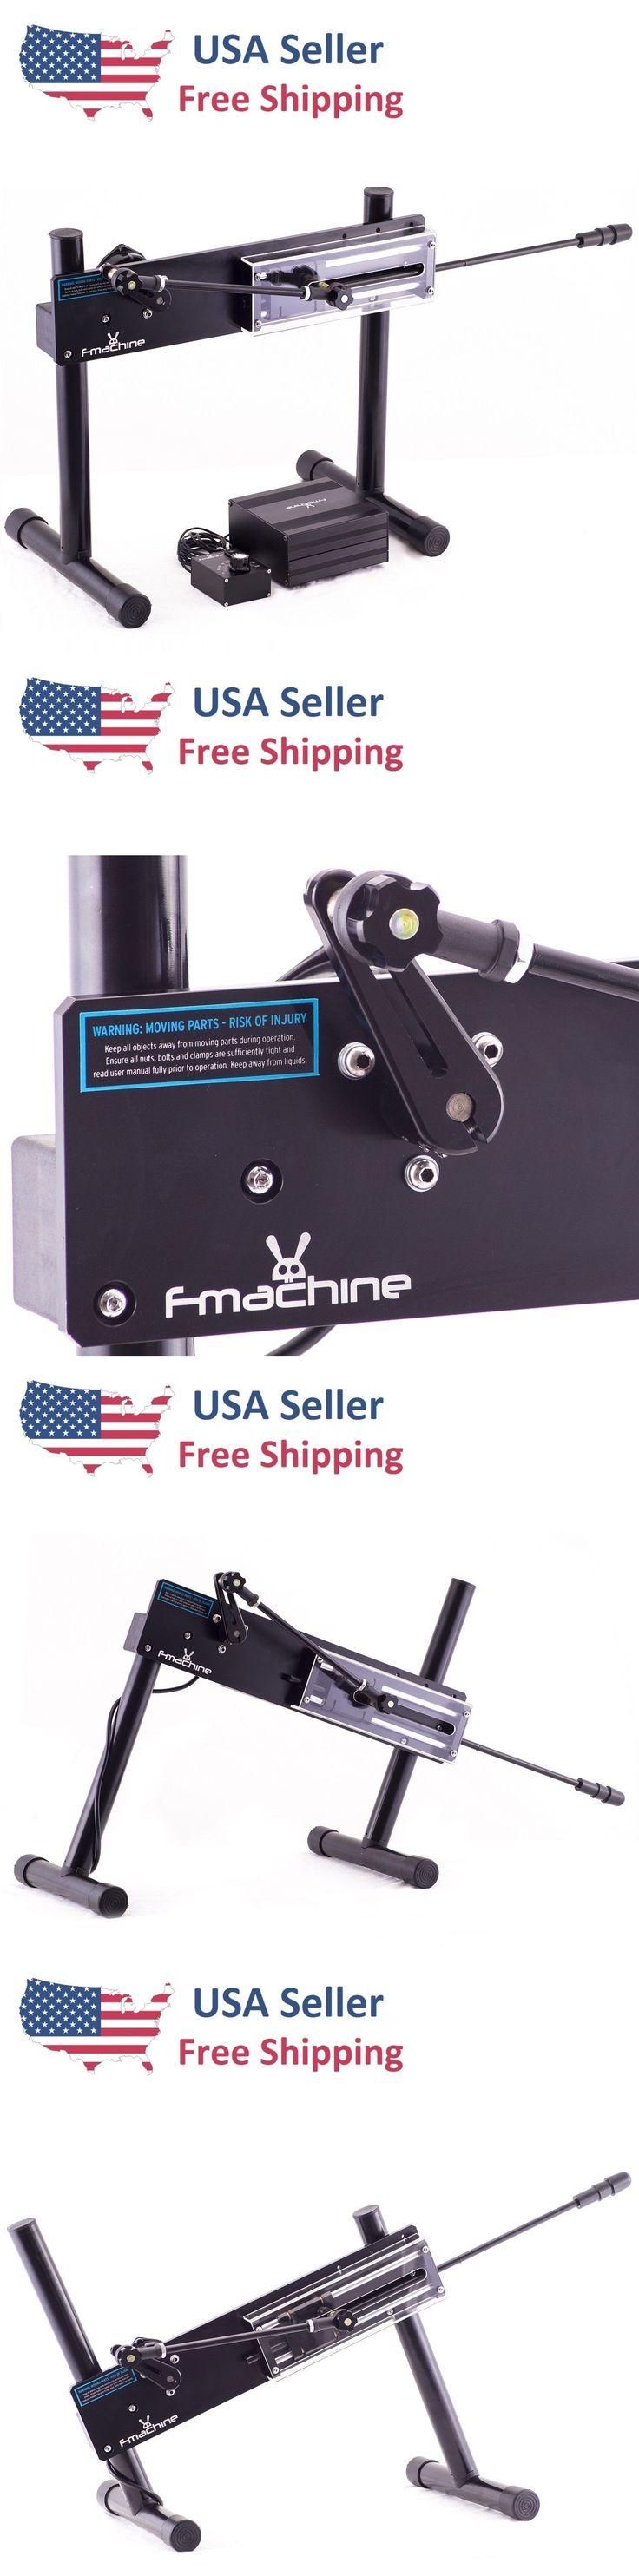 Other Sexual Wellness: F-Machine Pro 2 Sex Machine (Love Machine) + Vac-U-Lock Attachment BUY IT NOW ONLY: $599.0